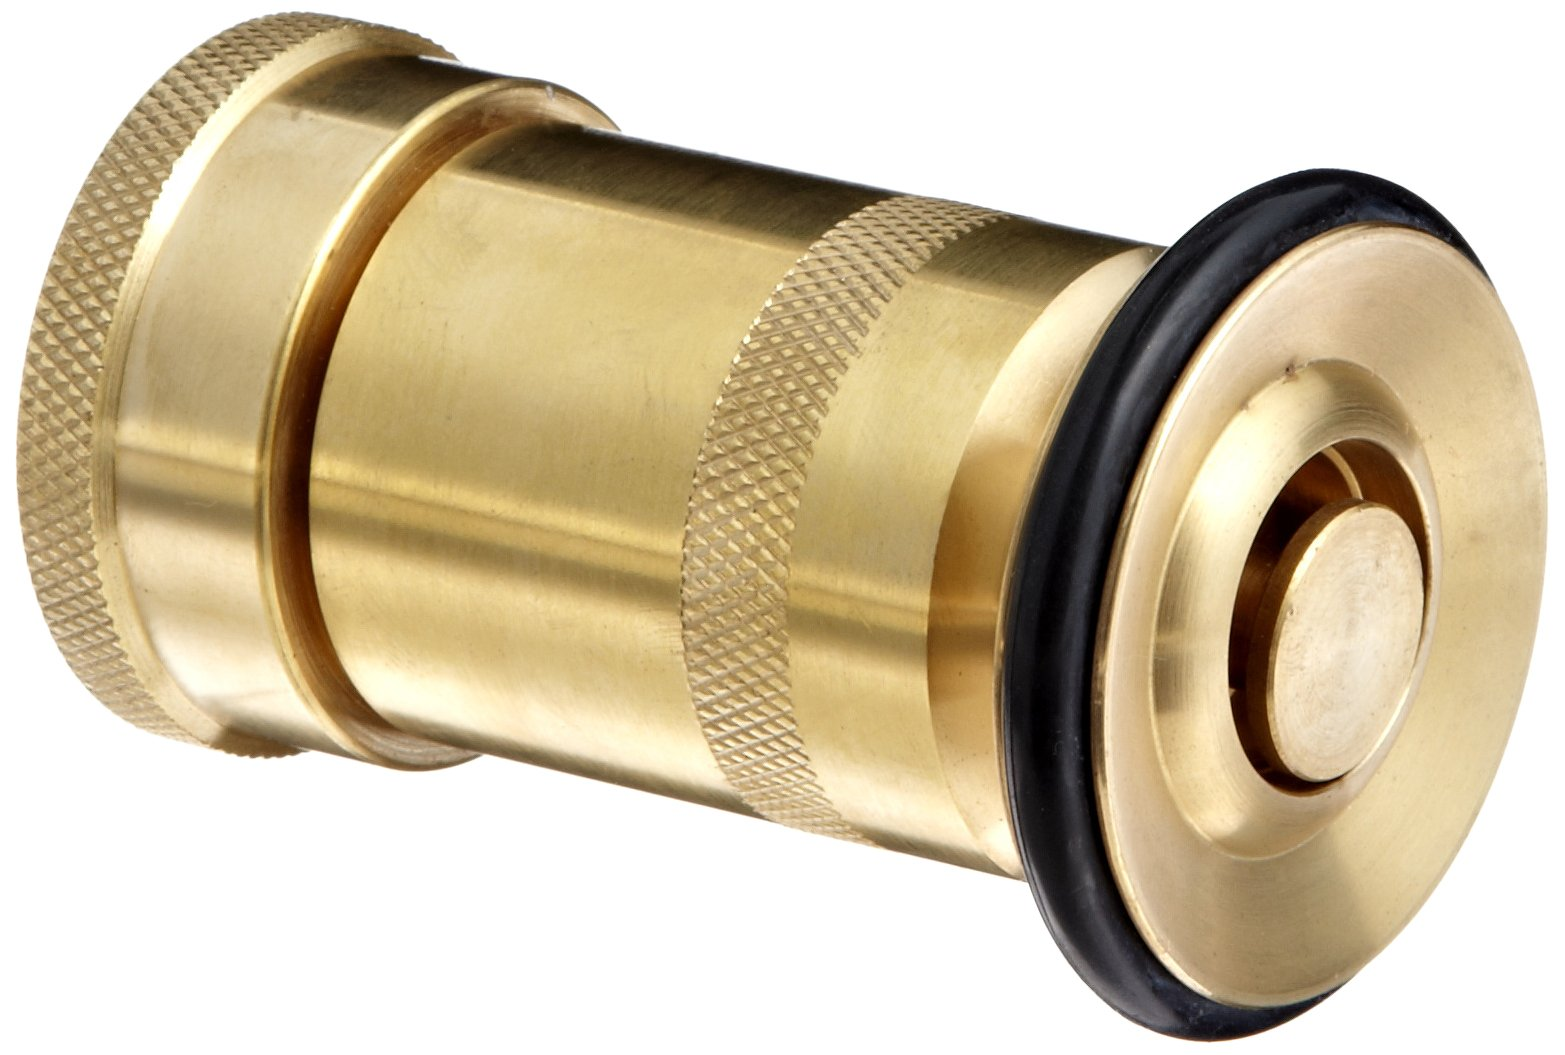 Moon 520-1021 Brass Fire Hose Nozzle, Heavy Duty Industrial Fog, 36 gpm, 1'' NH